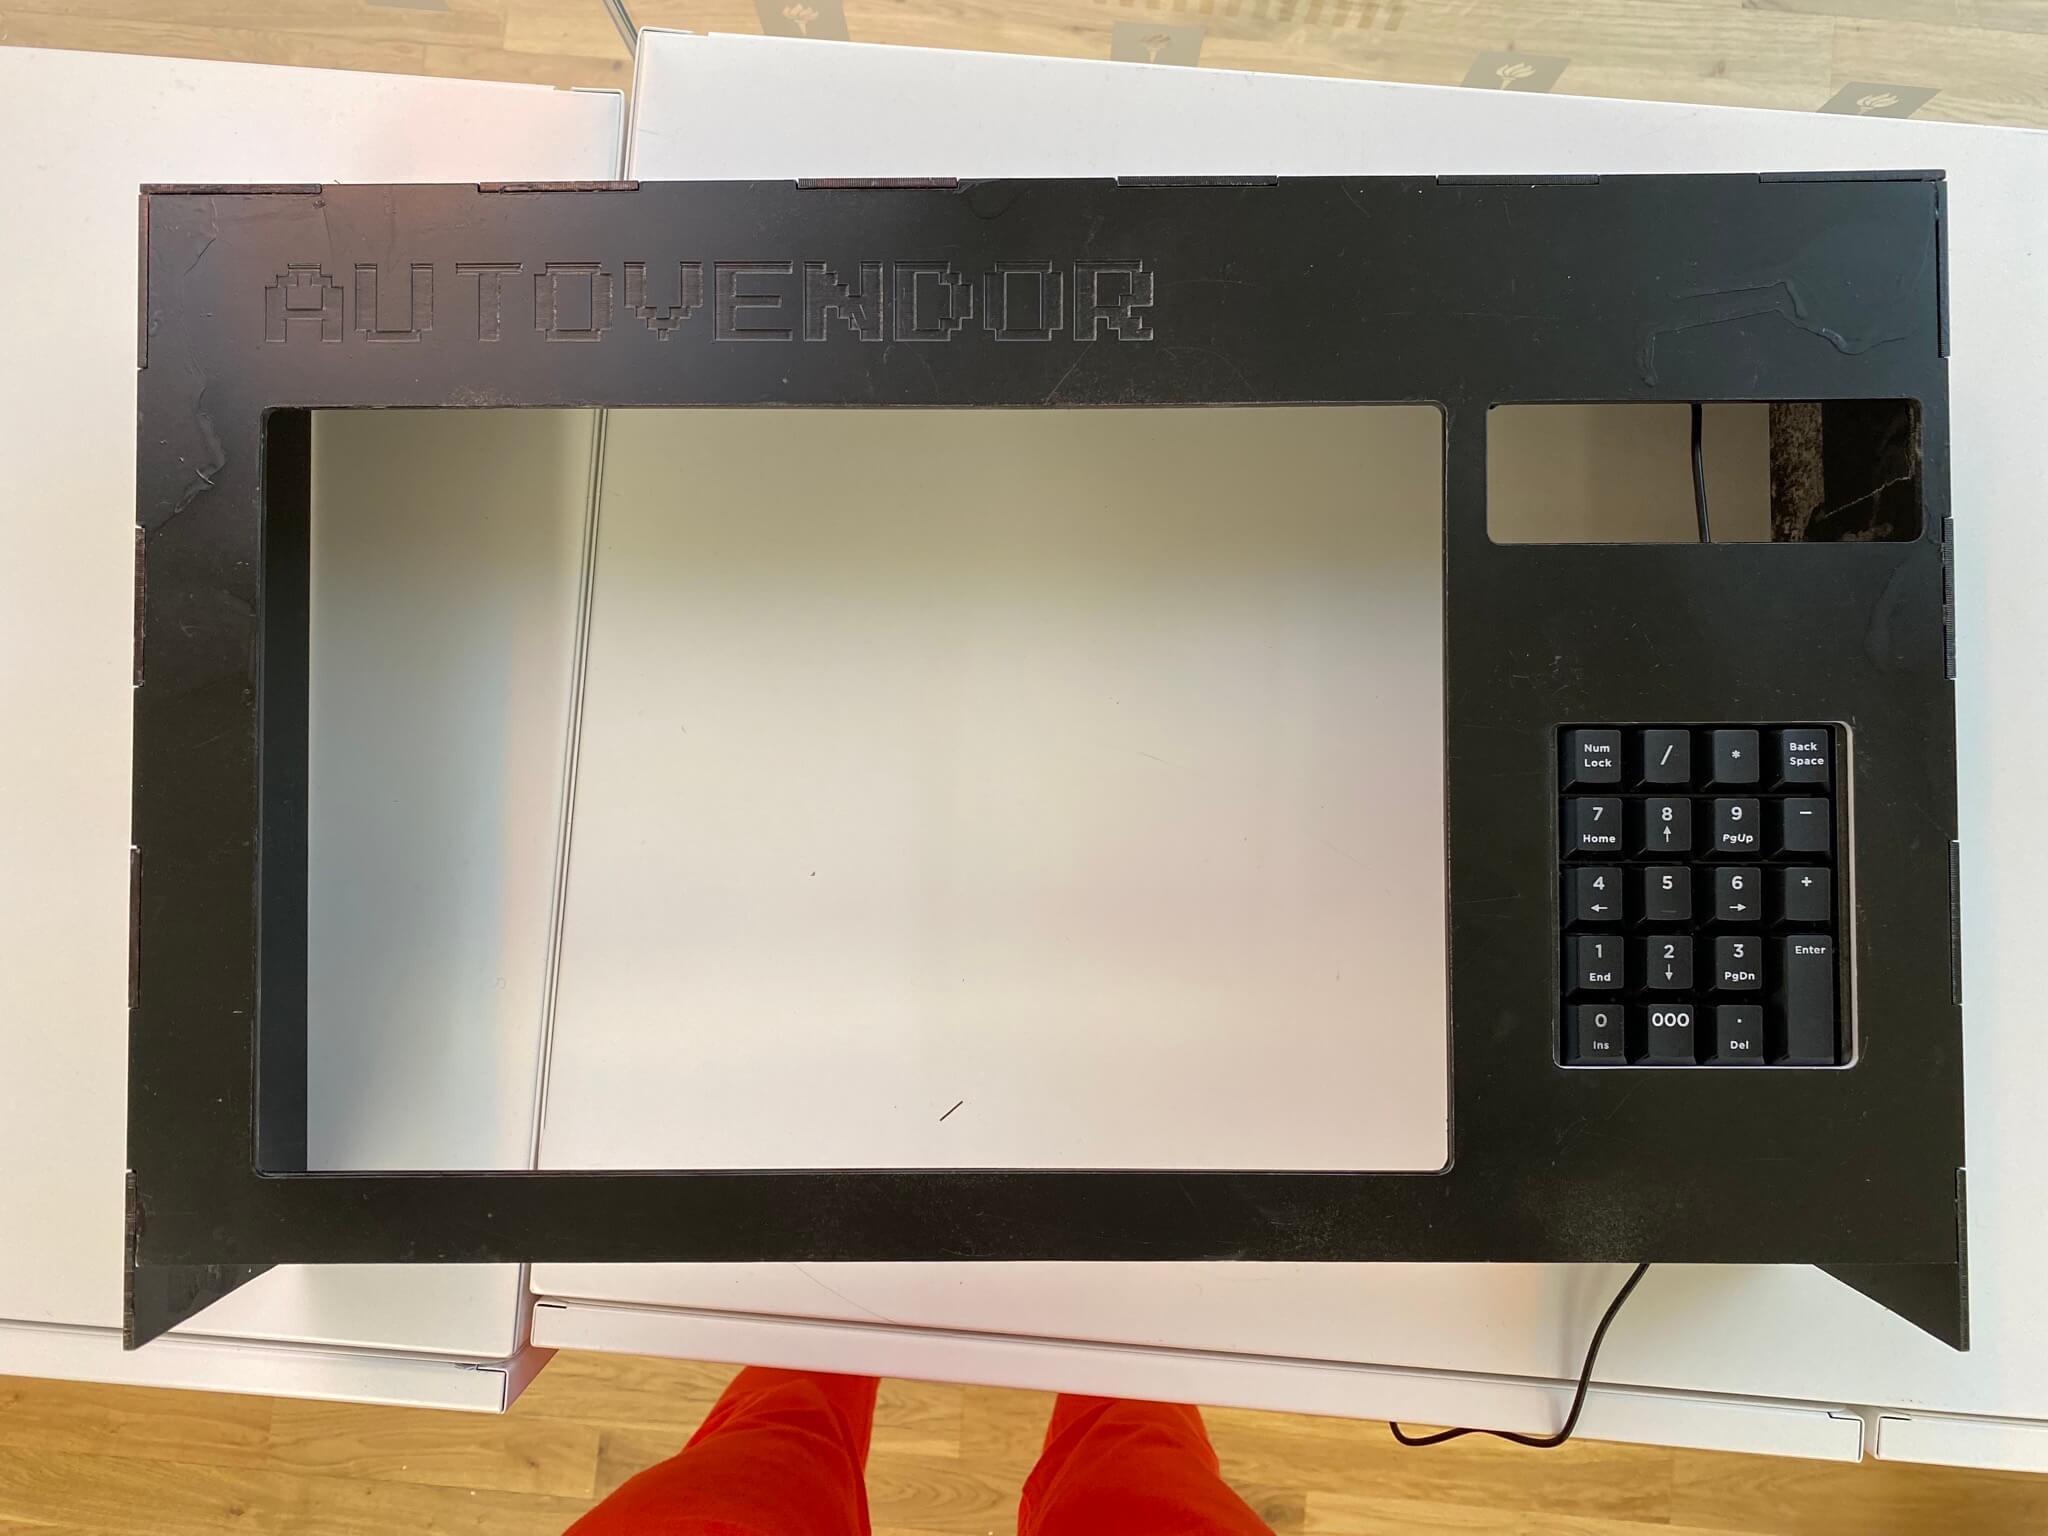 Vending machine casing